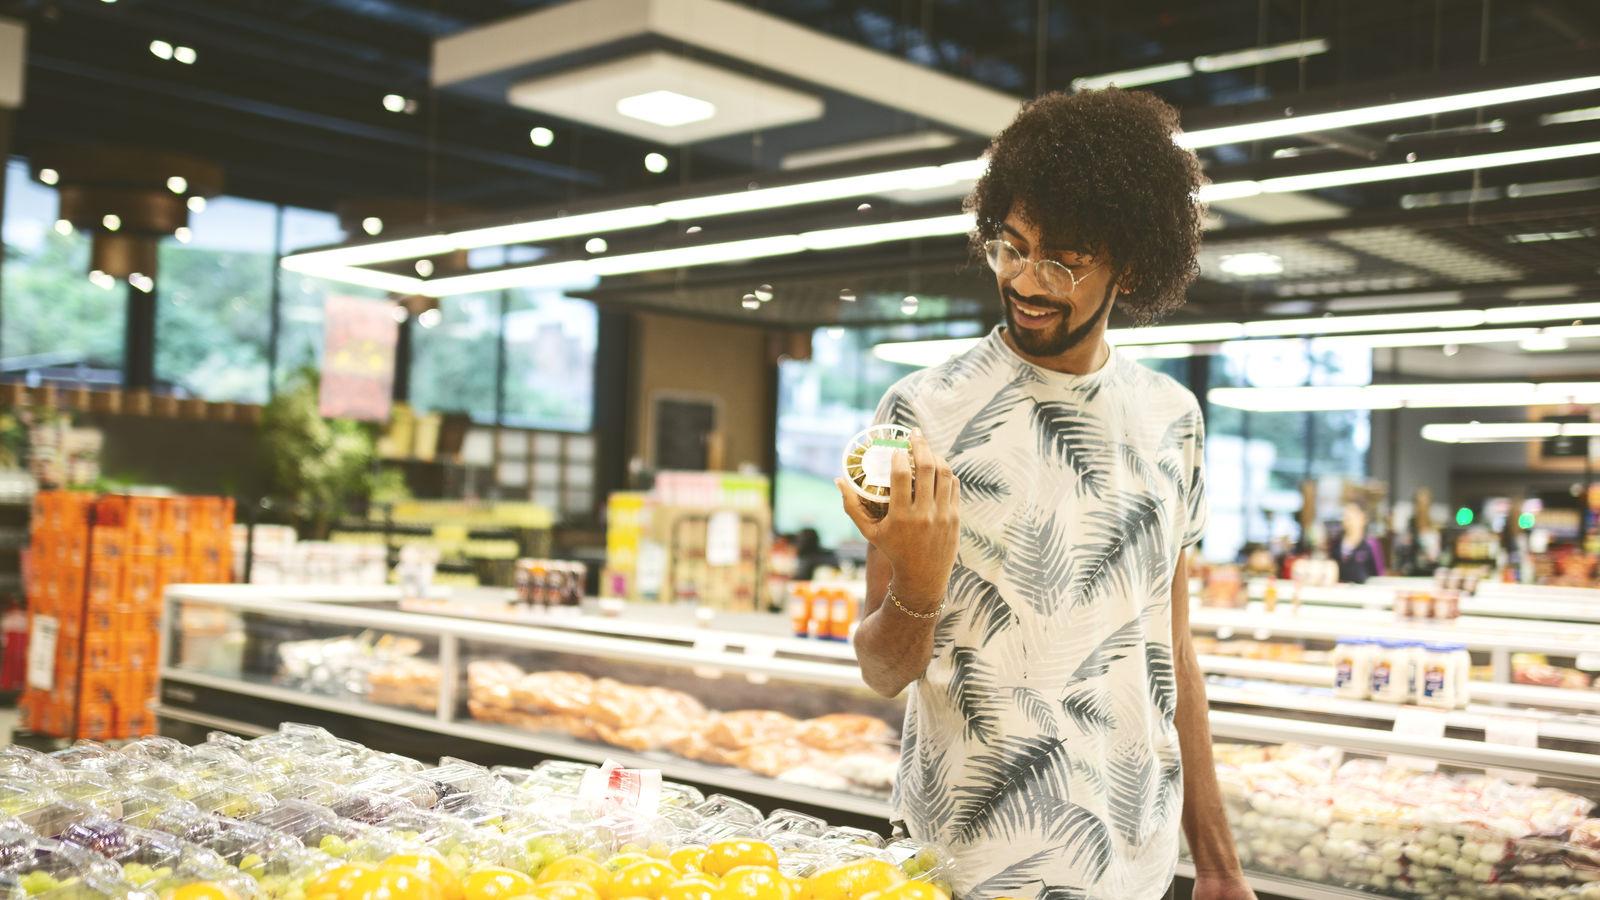 Young man at super market.